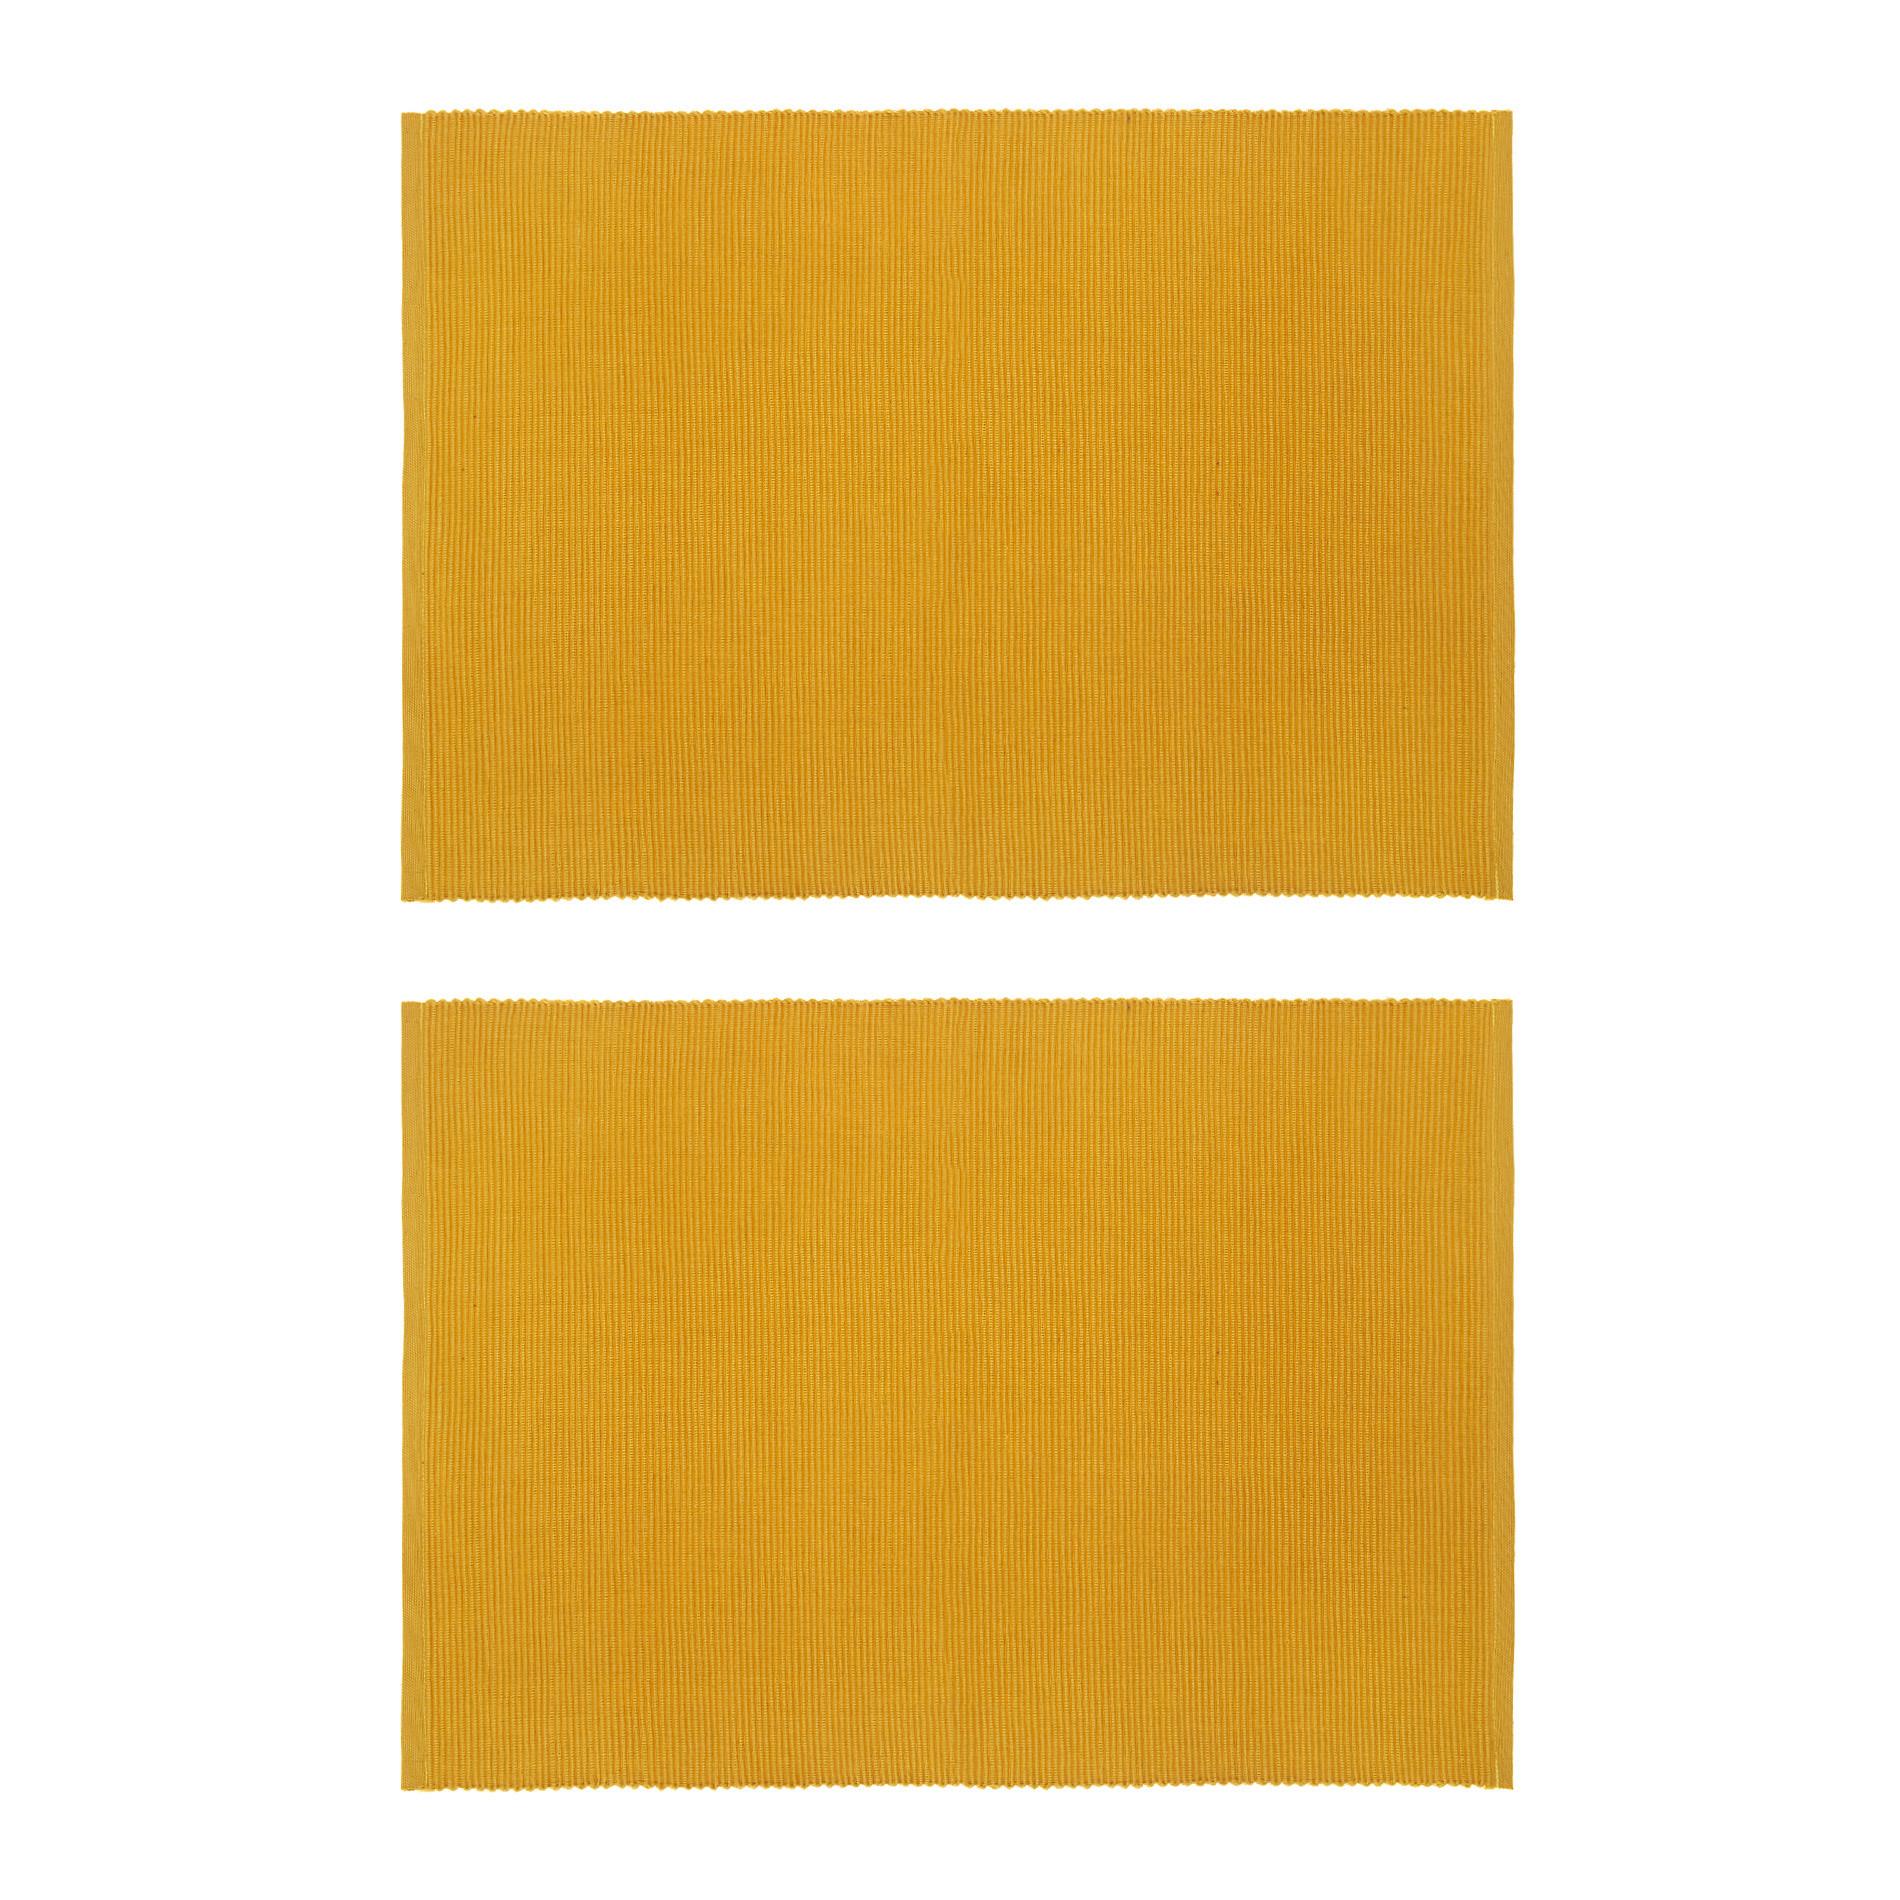 Set 2 tovagliette puro cotone tinta unita, Giallo ocra, large image number 0